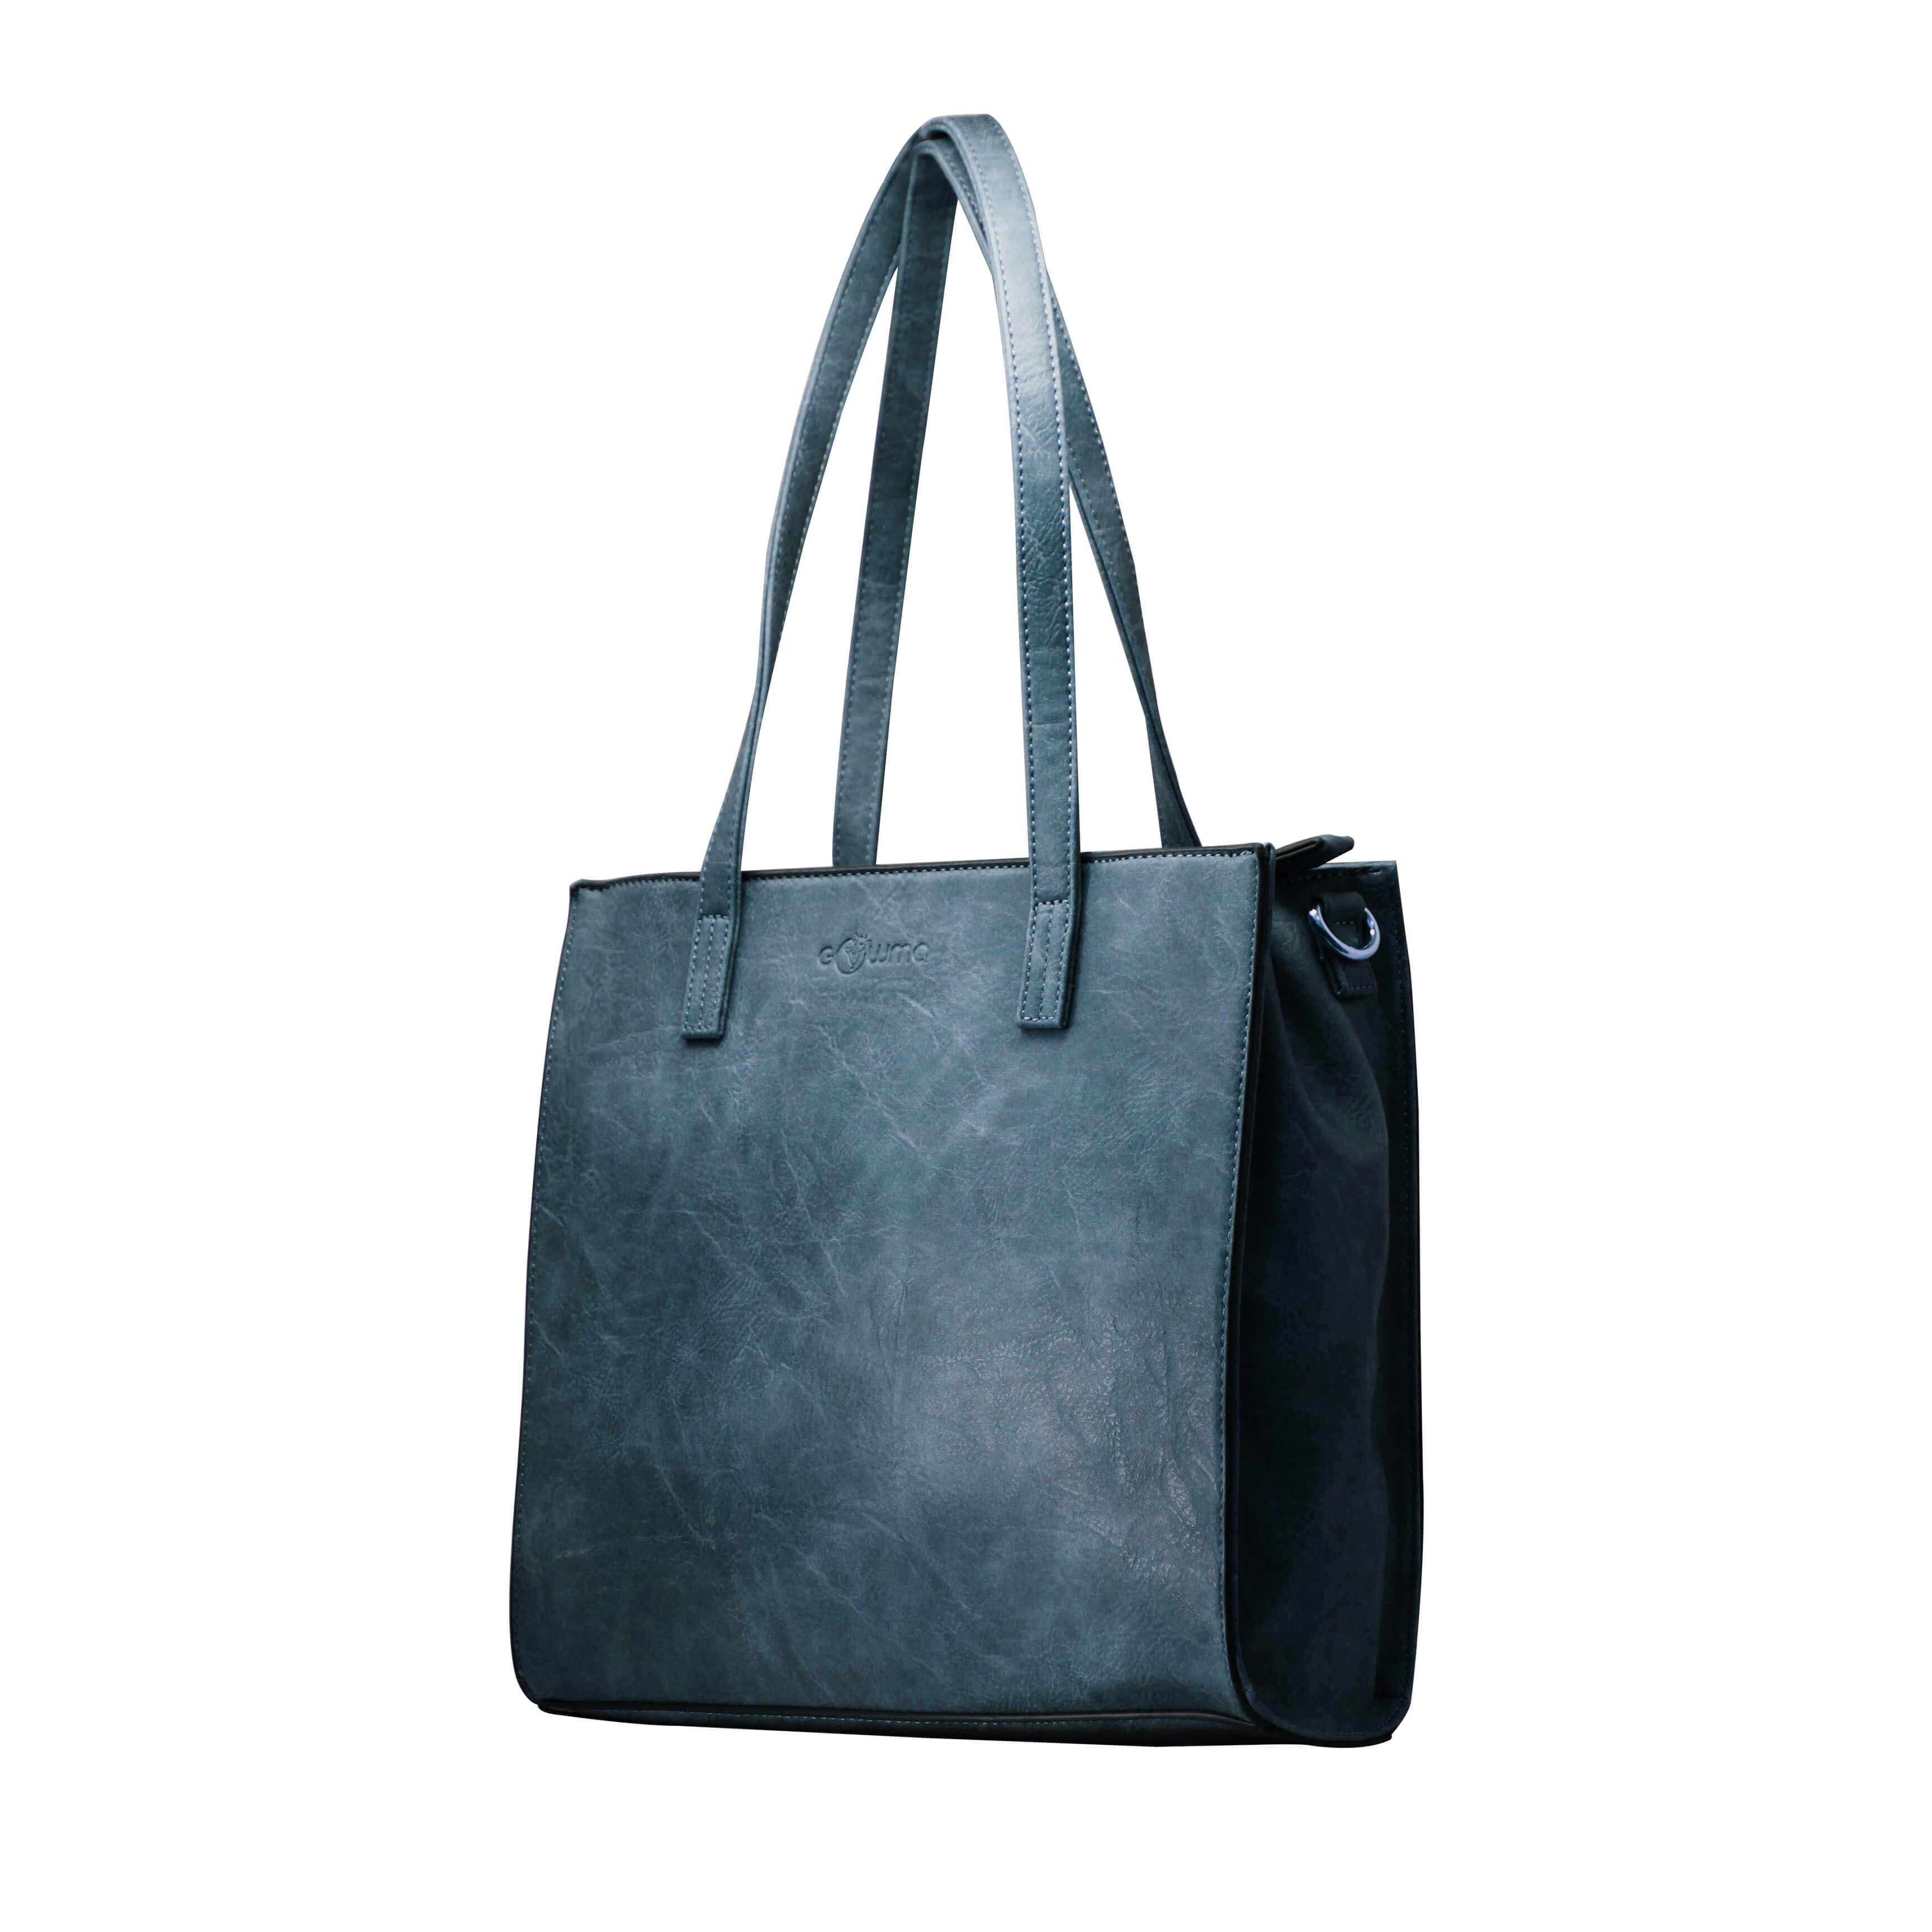 RECTANGULAR BOARDED BAG (RB)-BLUE 6